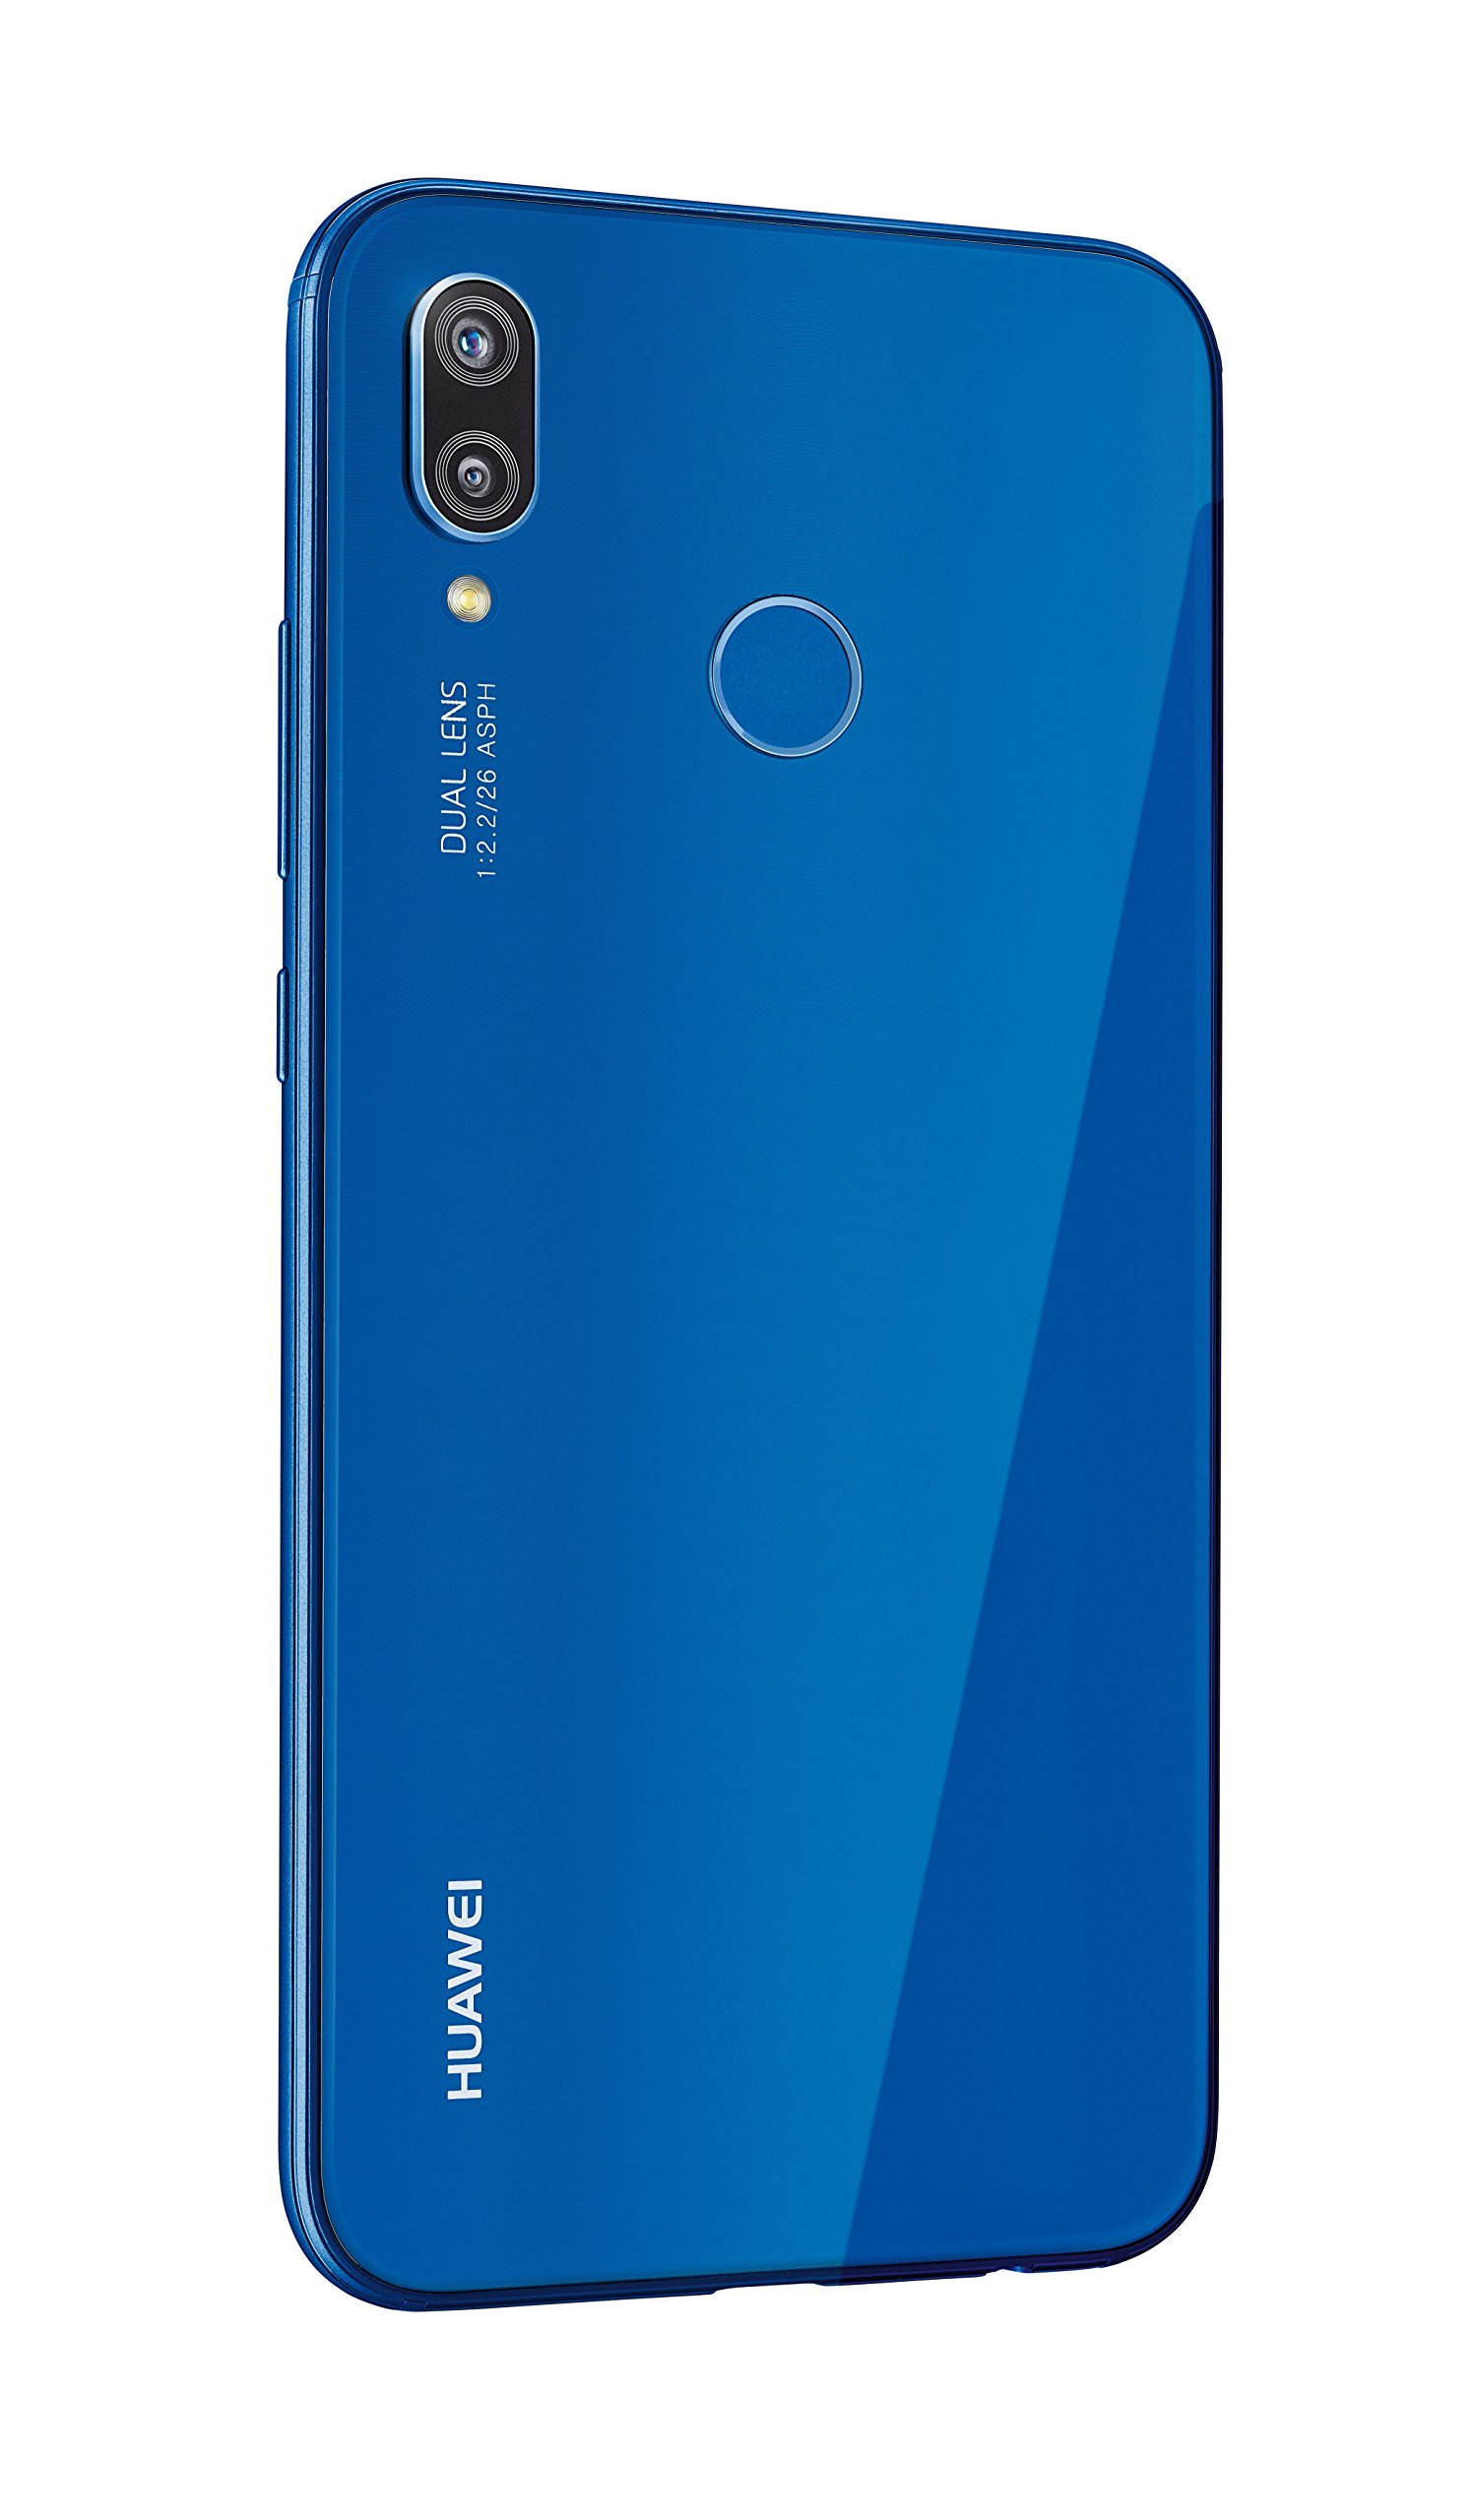 Huawei P20 Lite 64 GB/4 GB Smartphone-IT-P